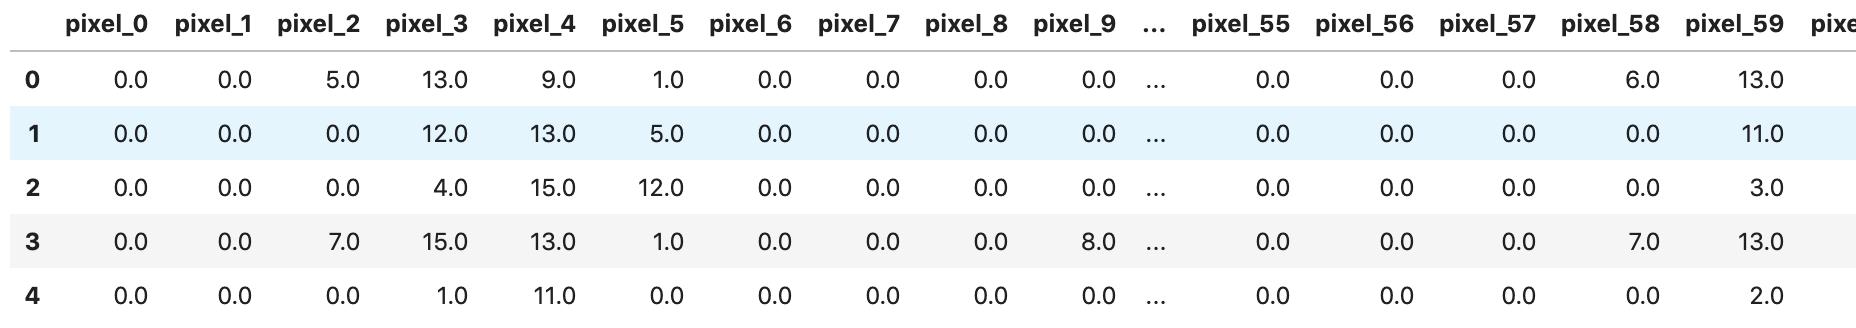 digits dataset